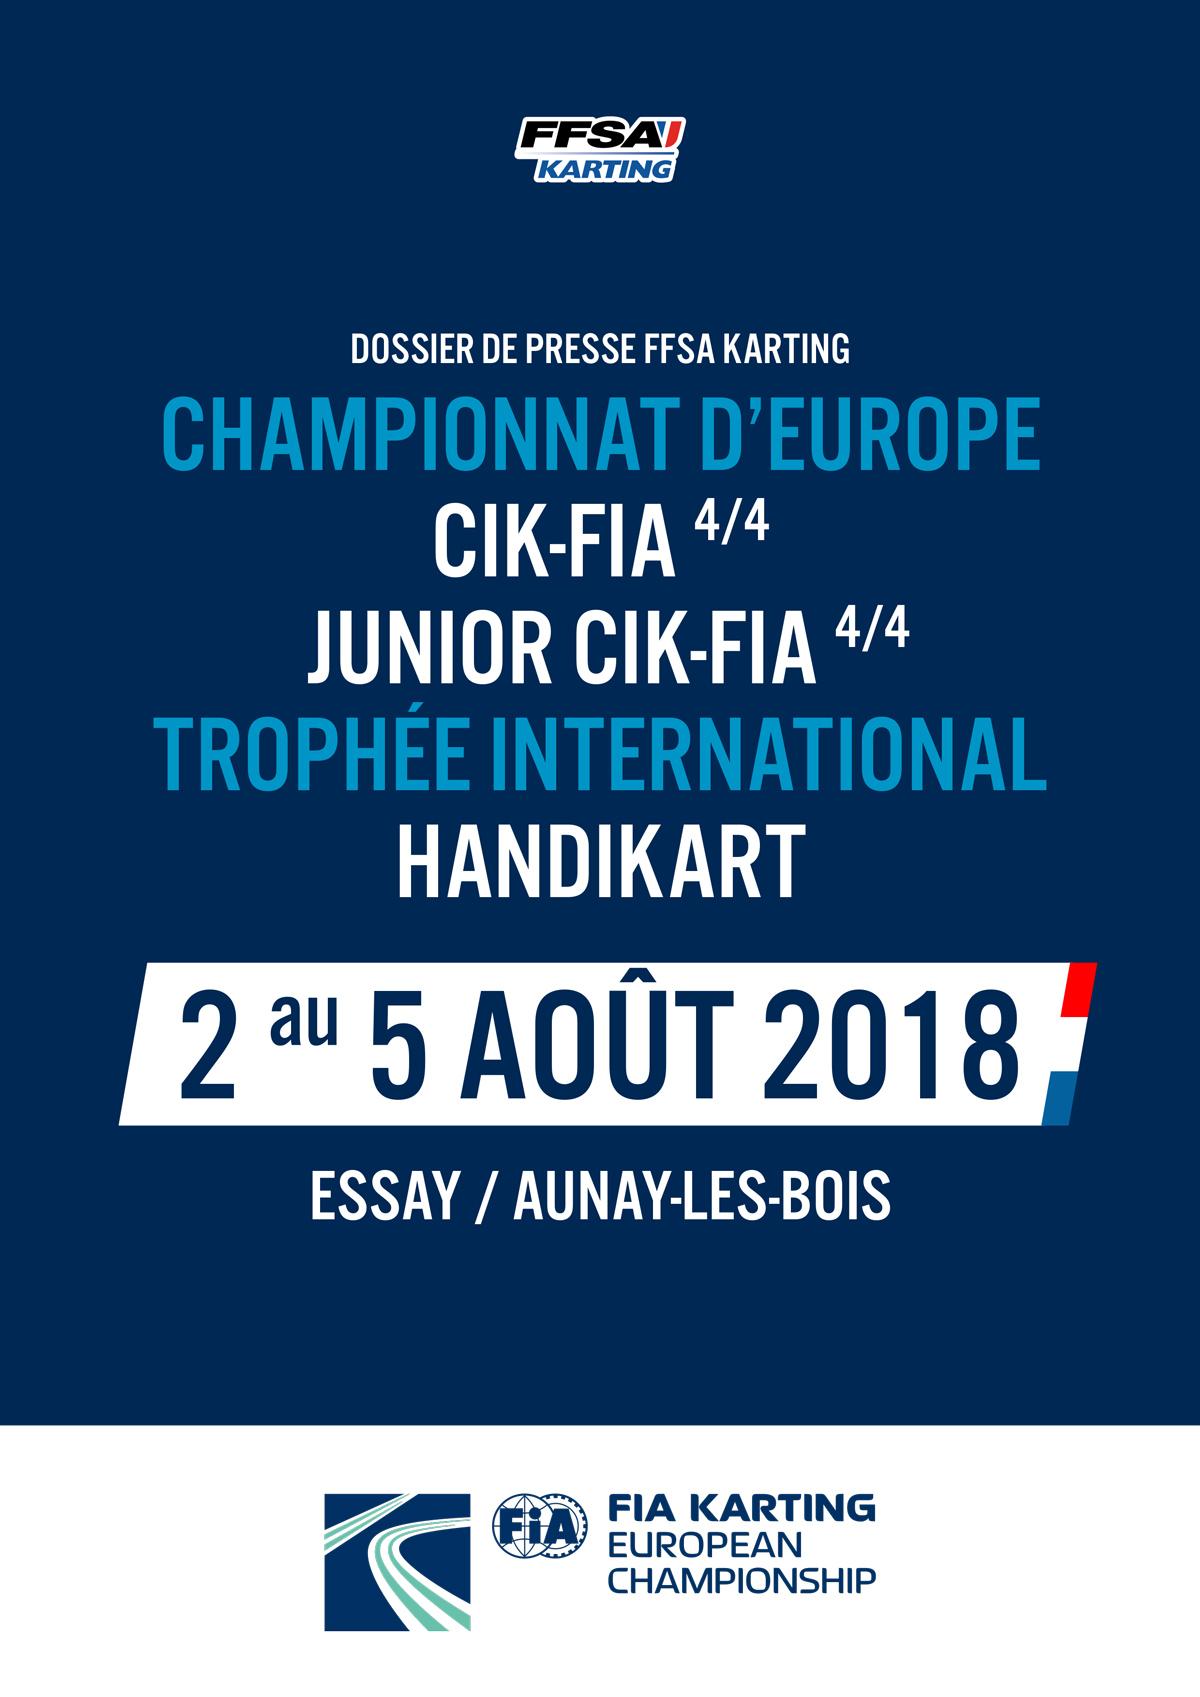 FFSA_Karting_2018_Dossier_Presentation_CIK-FIA_Aunay-les-Bois